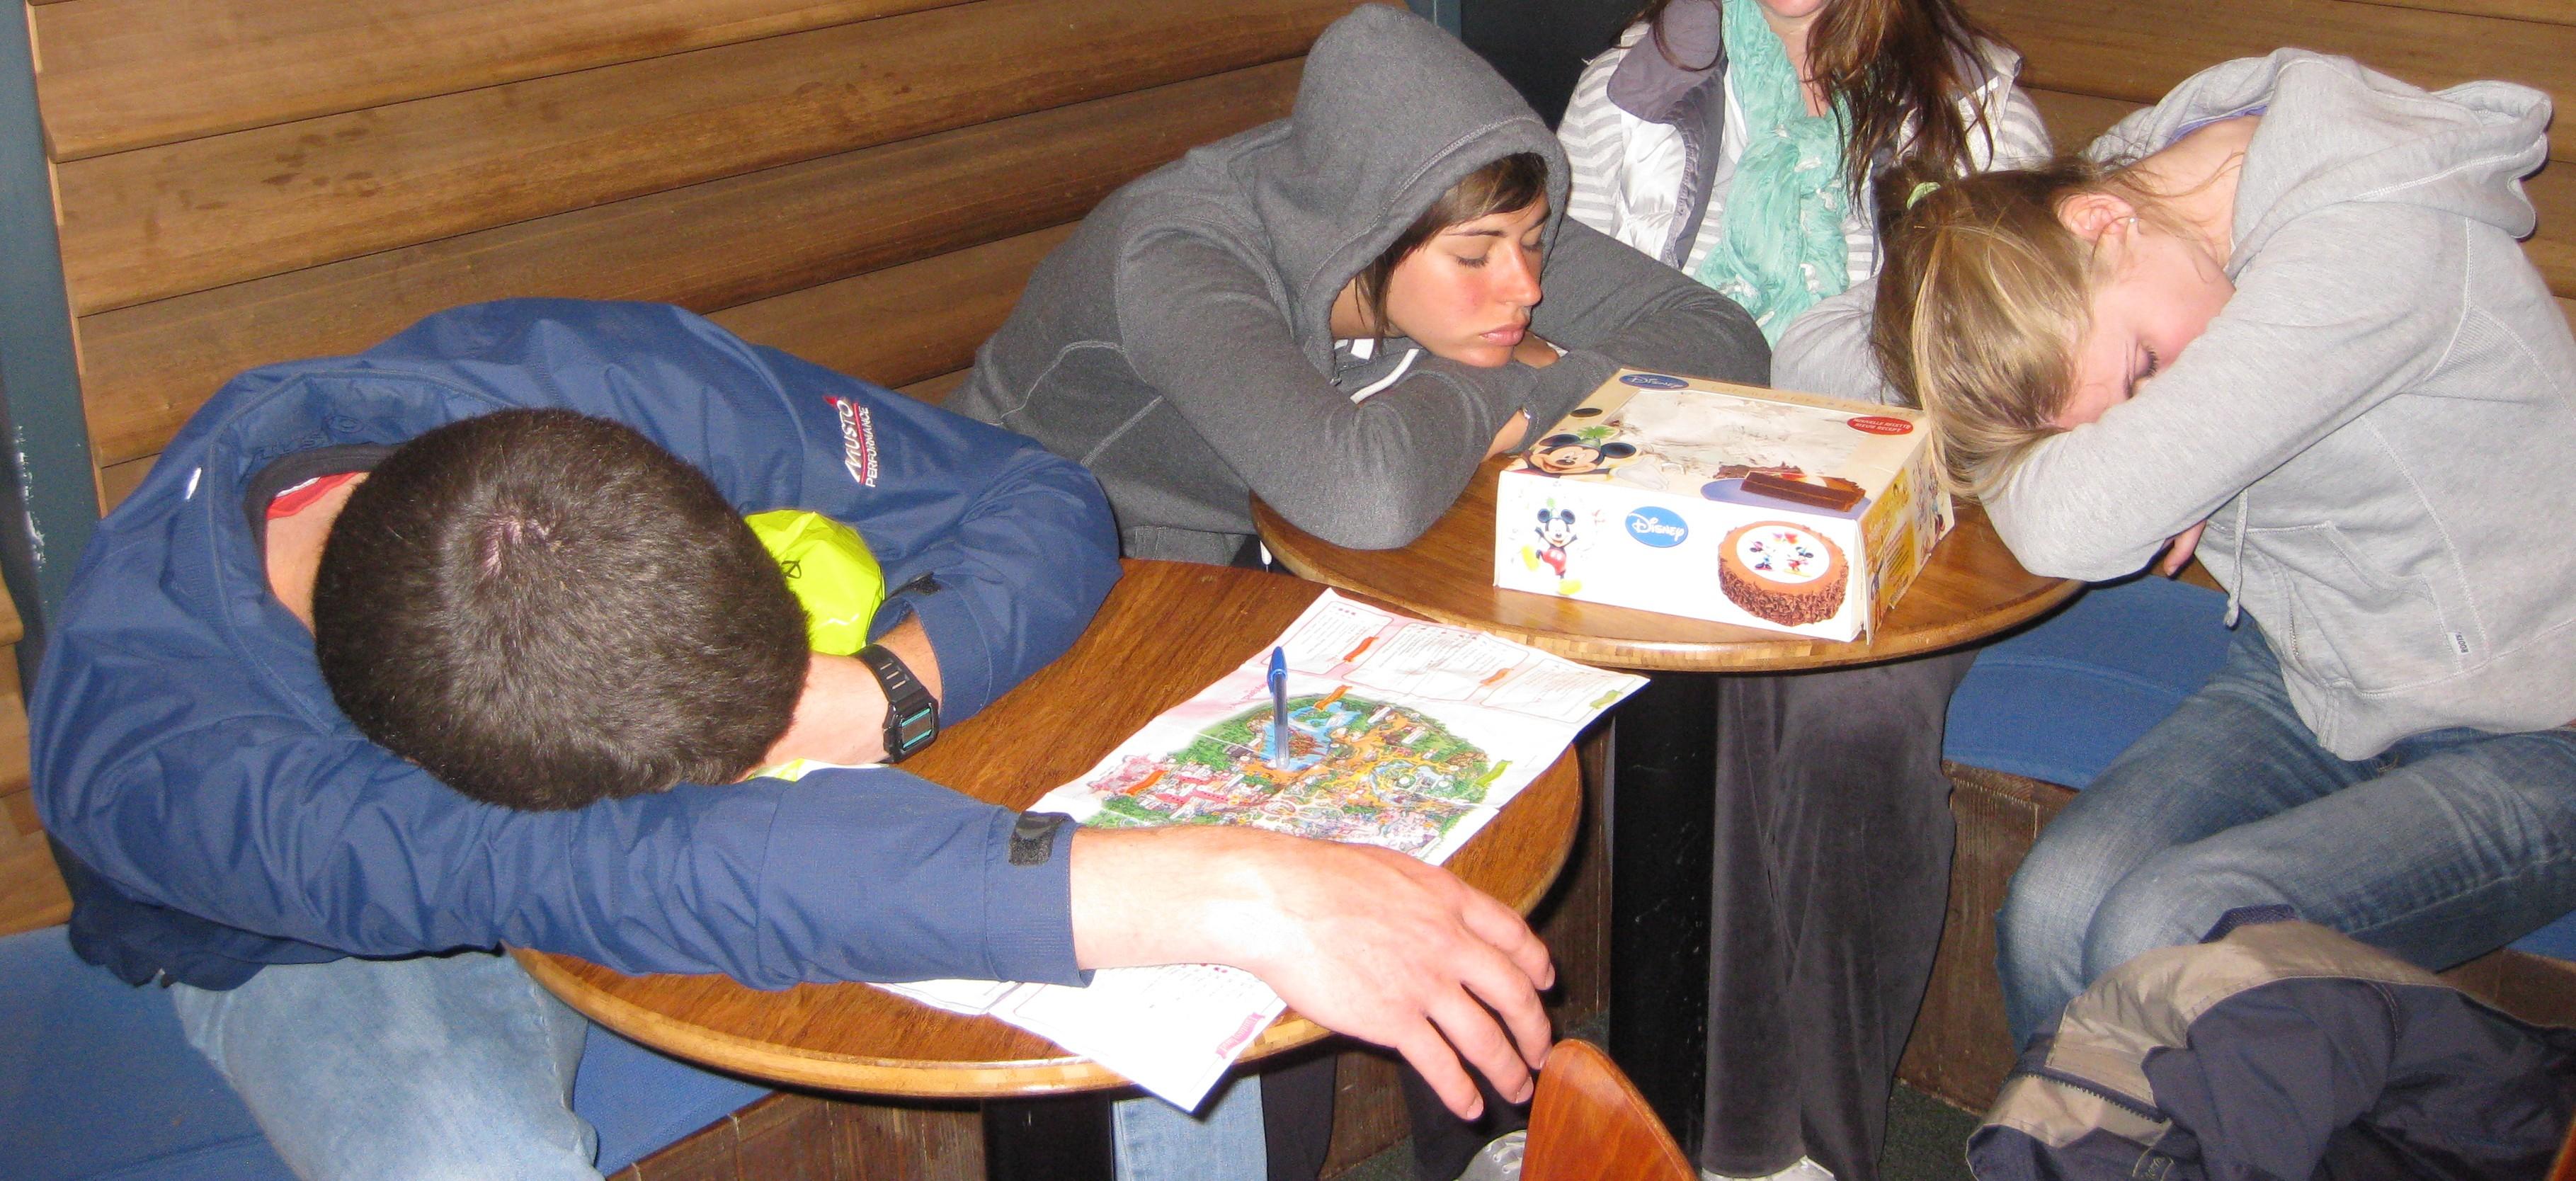 Pythagoras Trousers: Anaesthetics and sleep